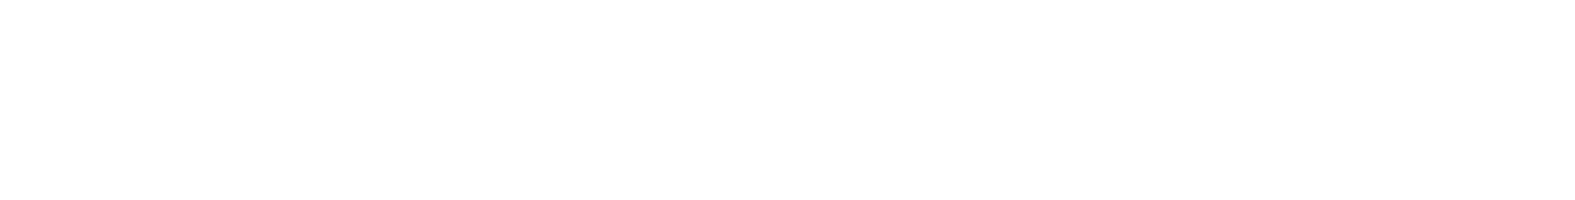 diver-logo-jp-w